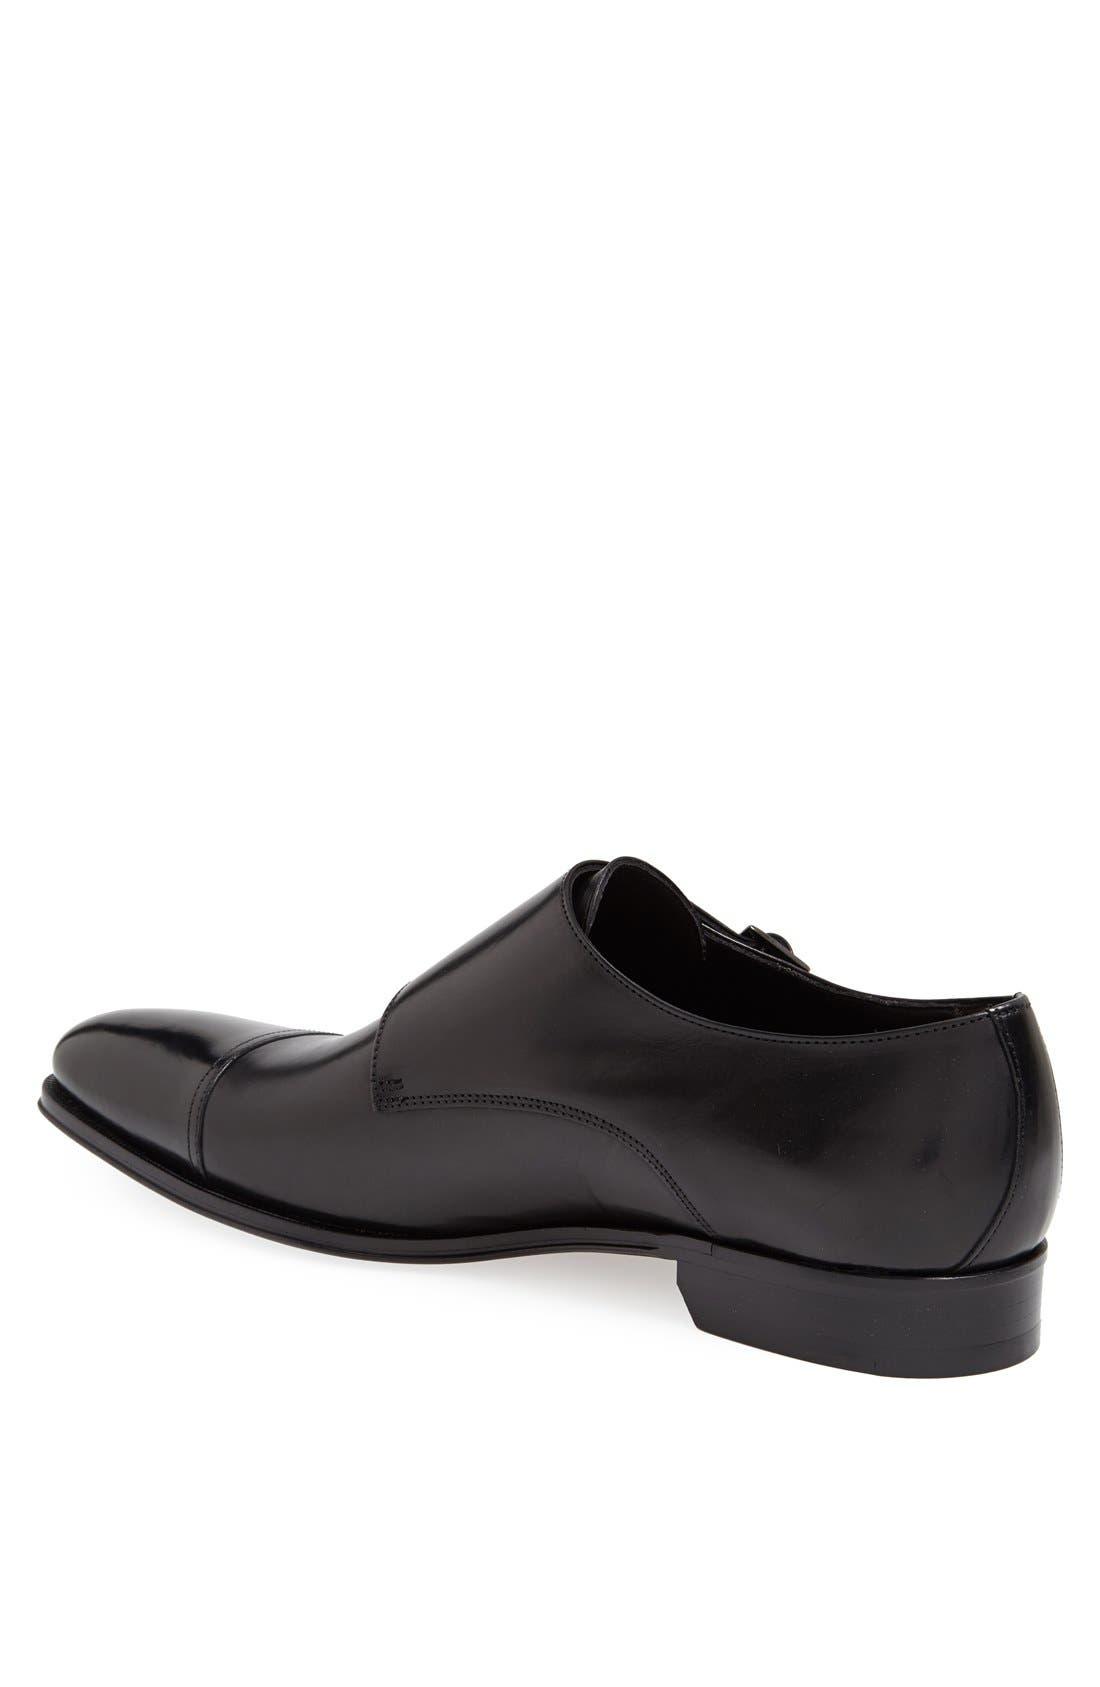 TO BOOT NEW YORK, 'Grant' Double Monk Shoe, Alternate thumbnail 2, color, BLACK CALFSKIN